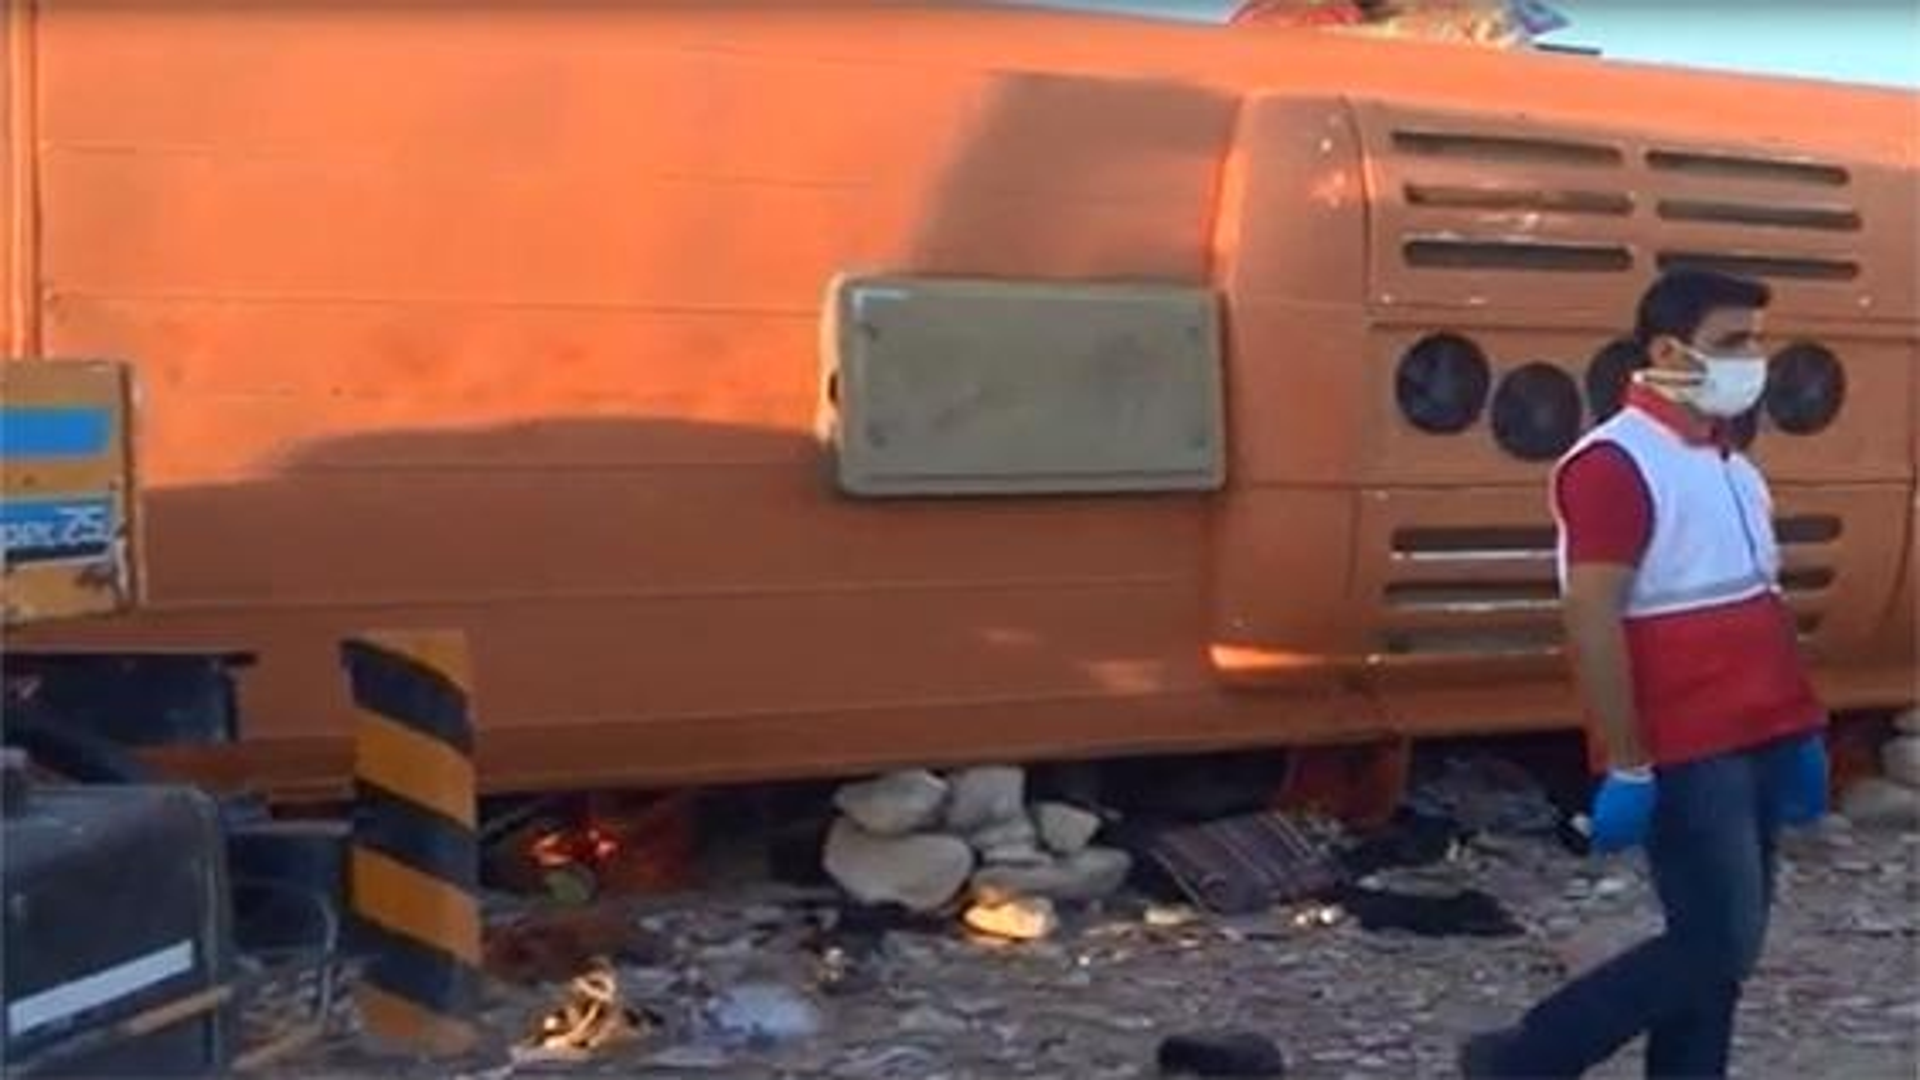 11 کشته بر اثر واژگونی اتوبوس دانشآموزان هرمزگانی | فیلم